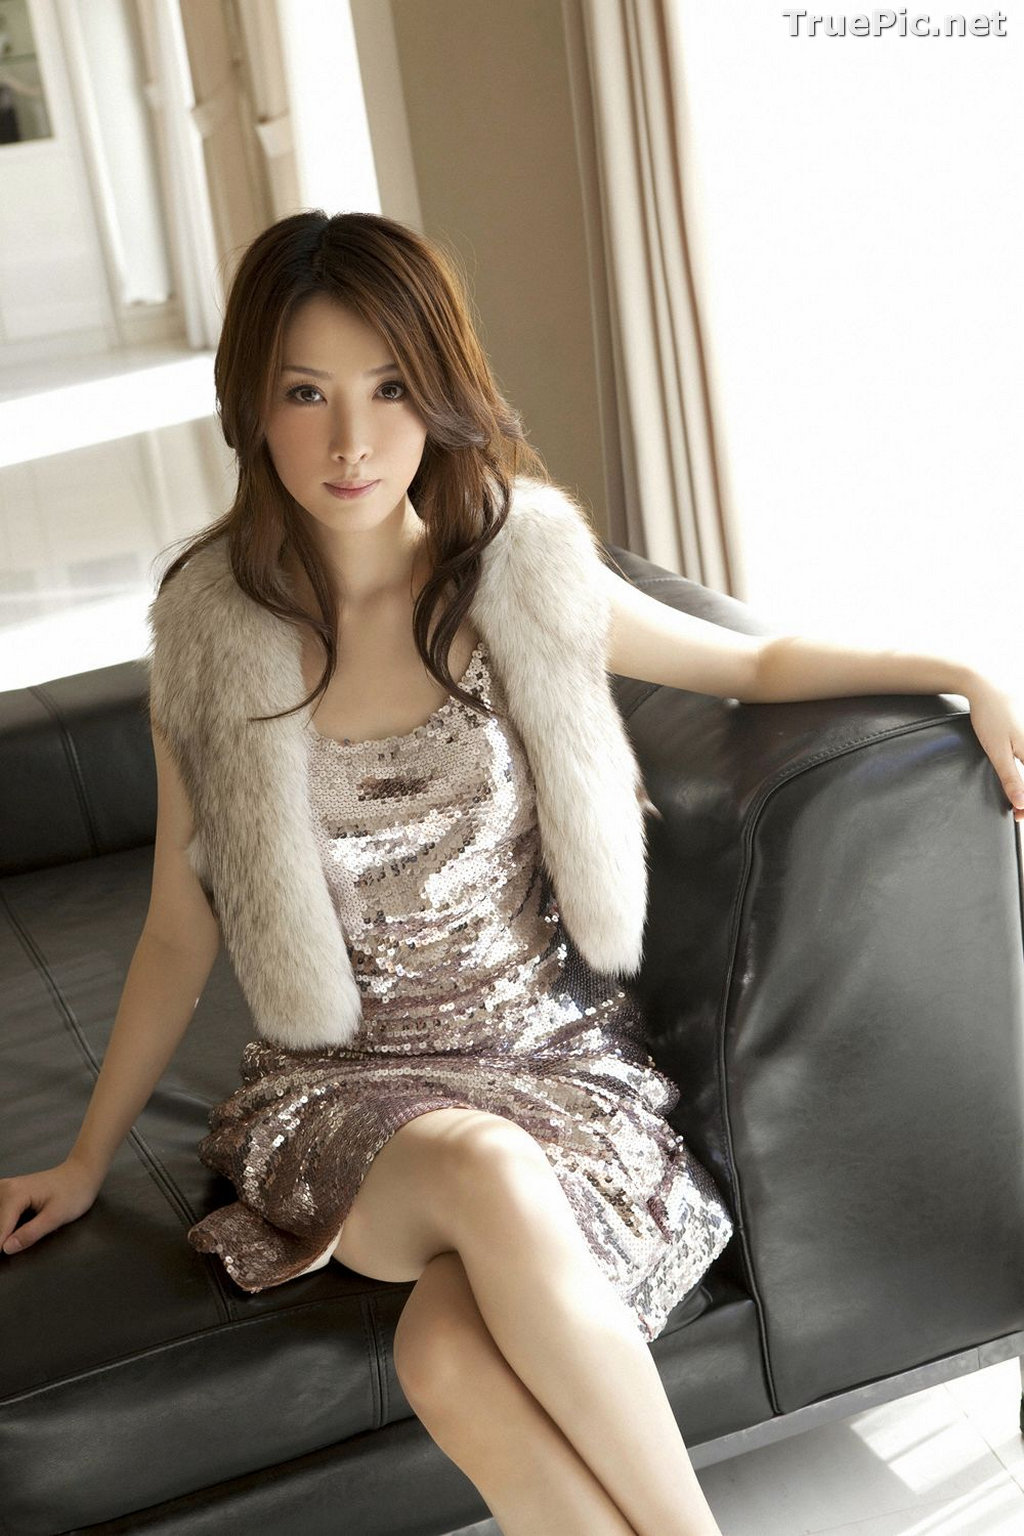 Image [YS Web] Vol.340 - Japanese Model and Actress - Saki Seto - TruePic.net - Picture-1